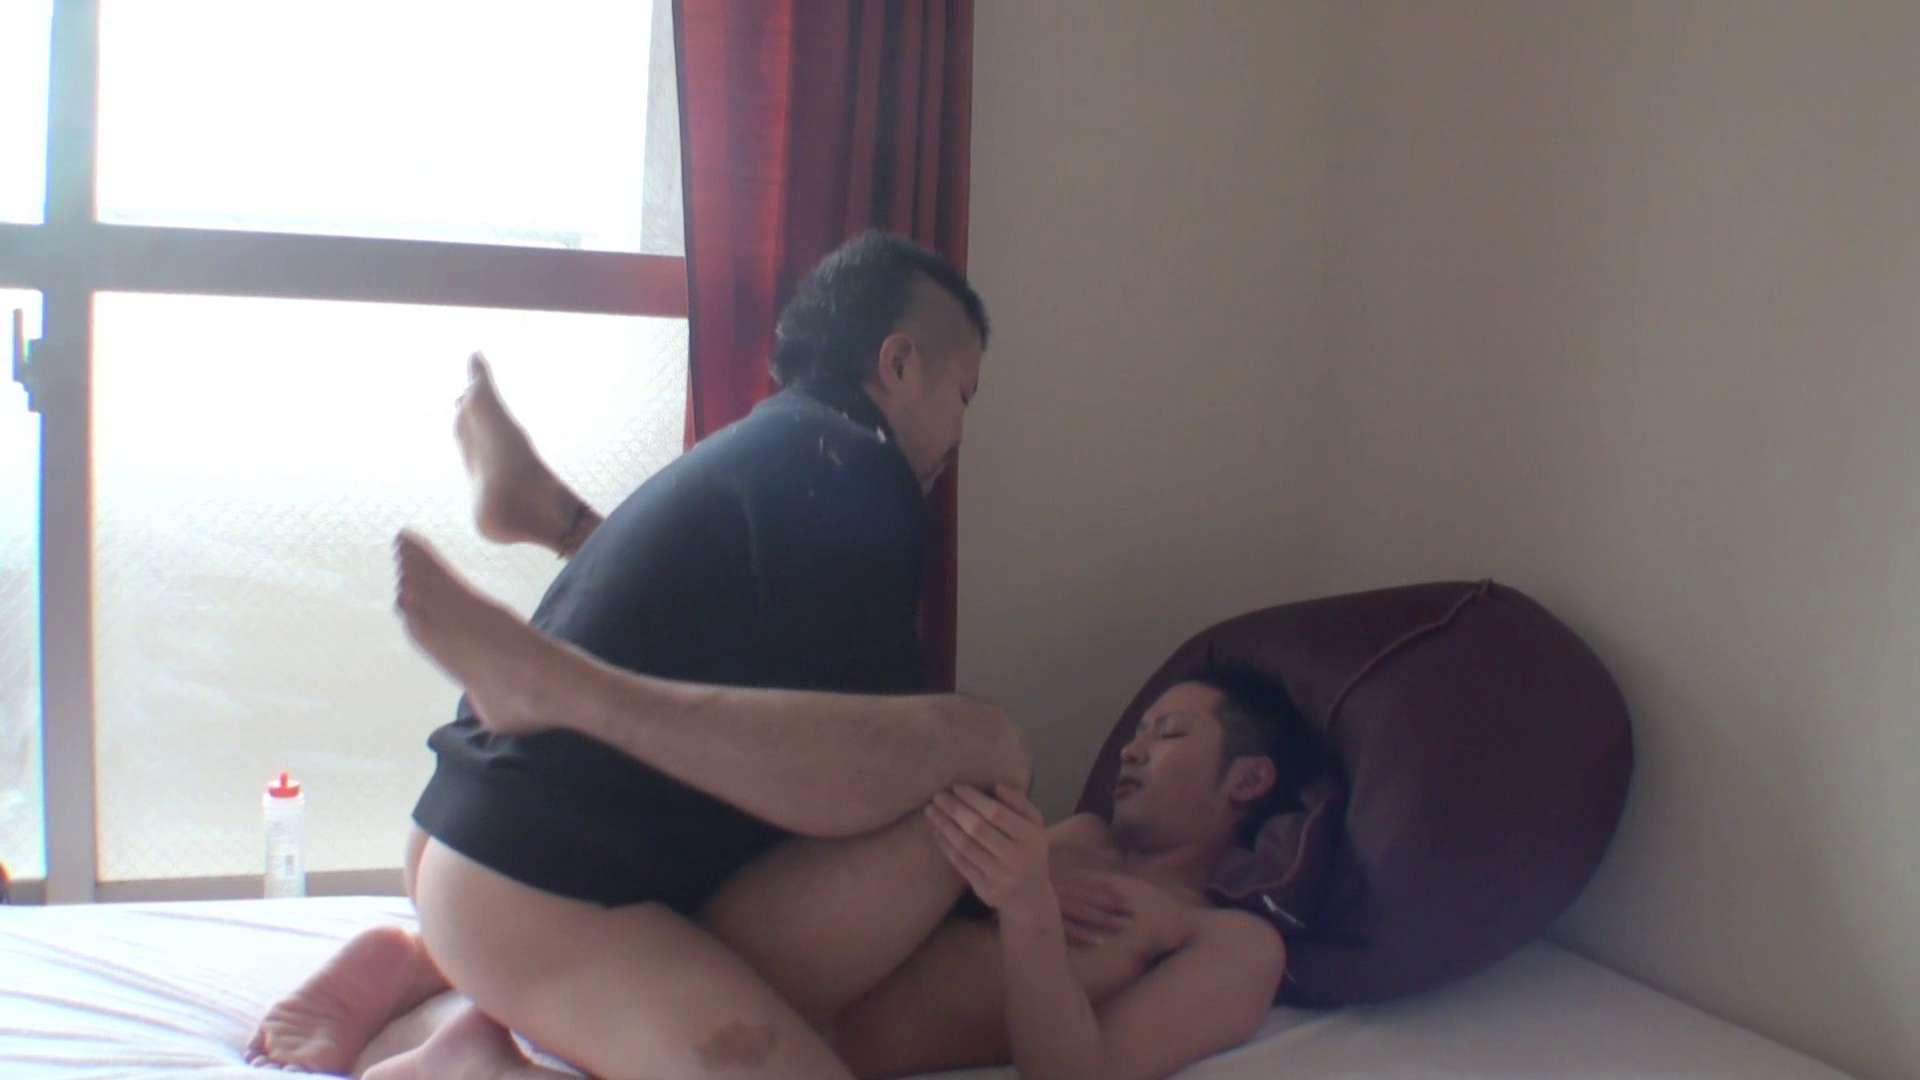 HD 良太と健二当たり前の日常 セックス編 男天国 | サル系ボーイズ  50pic 39